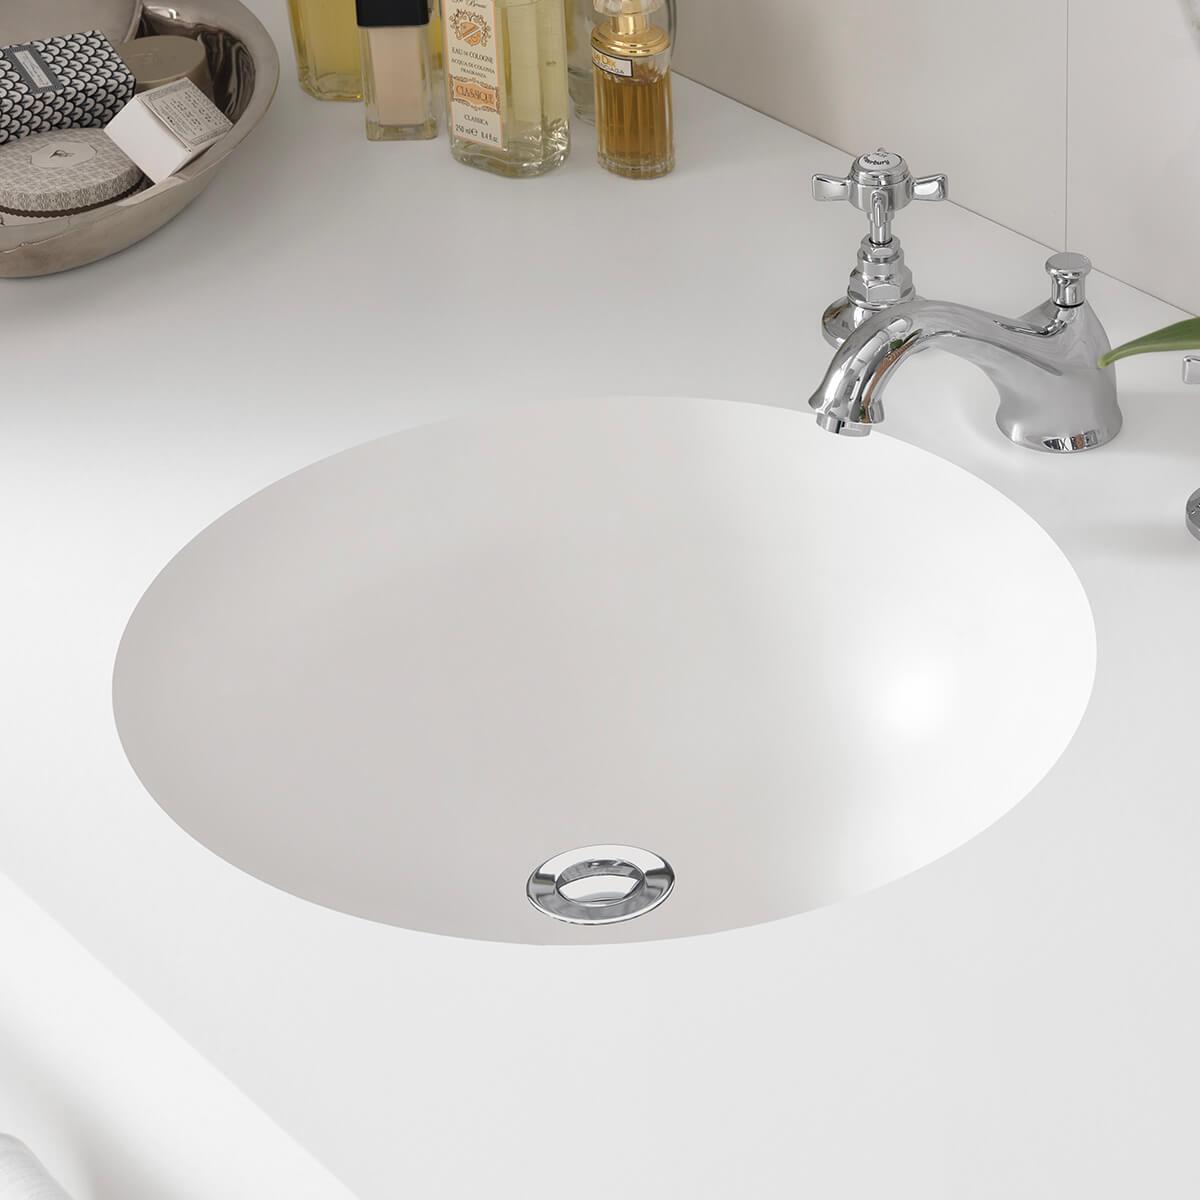 CASF corian basin smooth 8220 bathroom